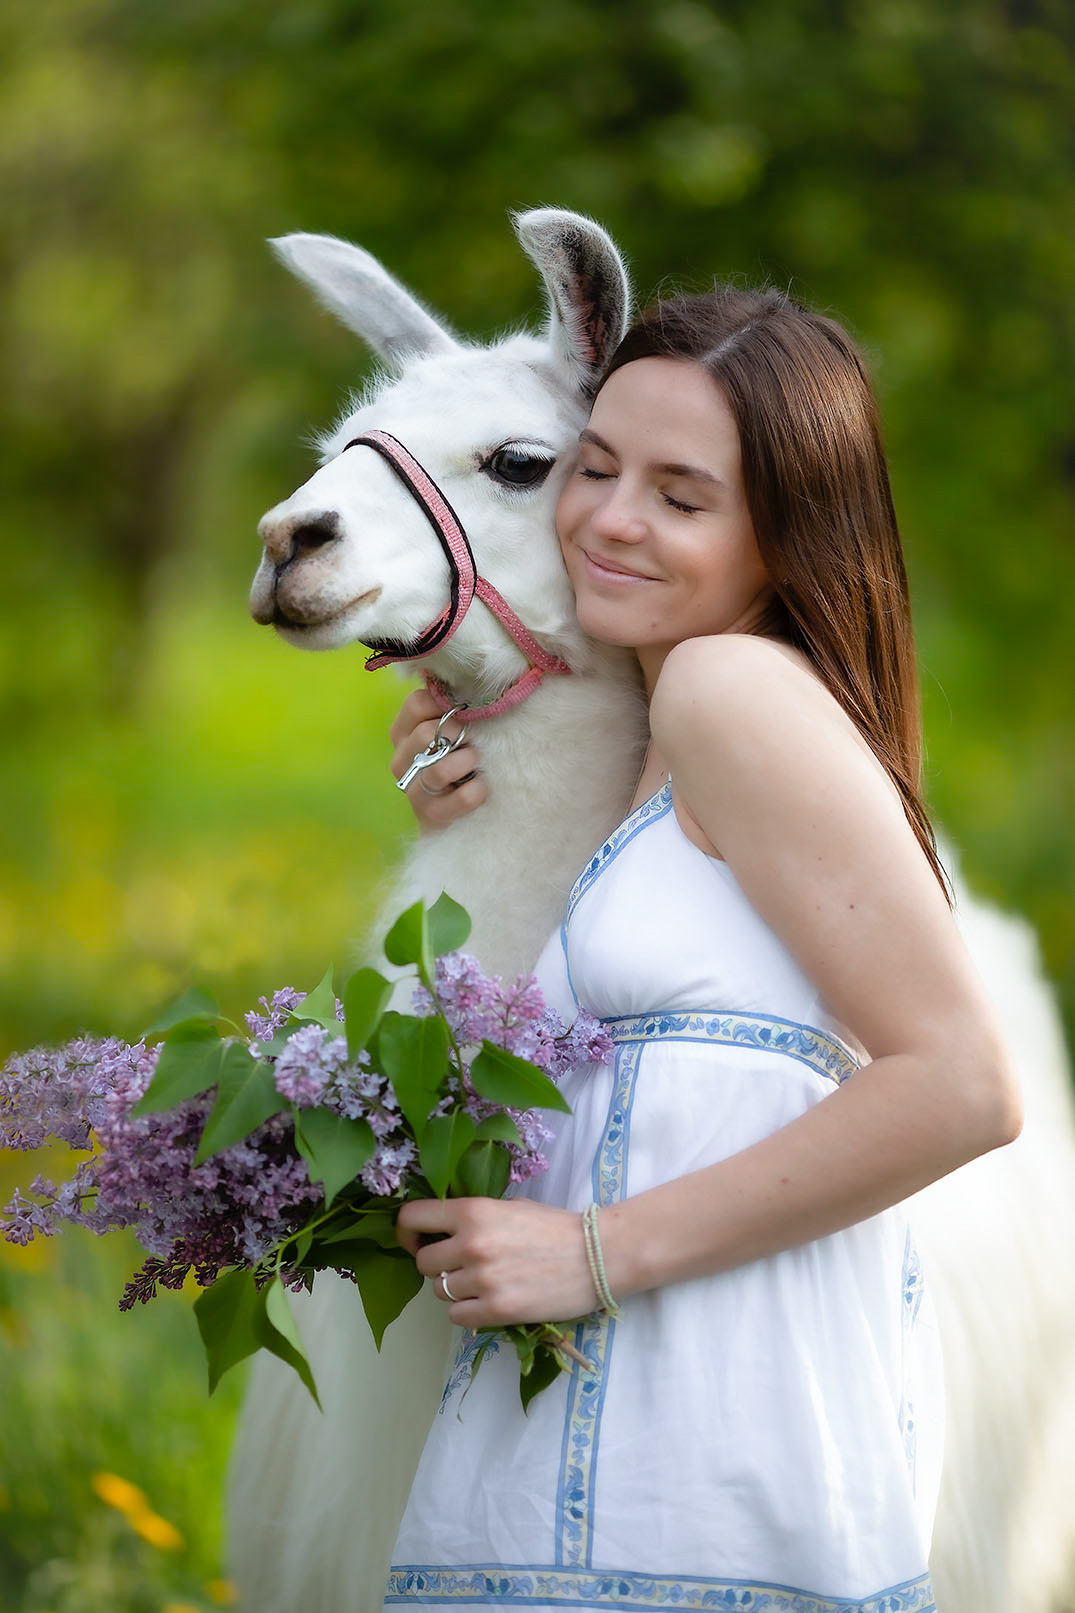 девушка,лама,дружба,красота, настроение, идиллия,природа, girl,lama, friends, emotions, nature, Стукалова Юлия